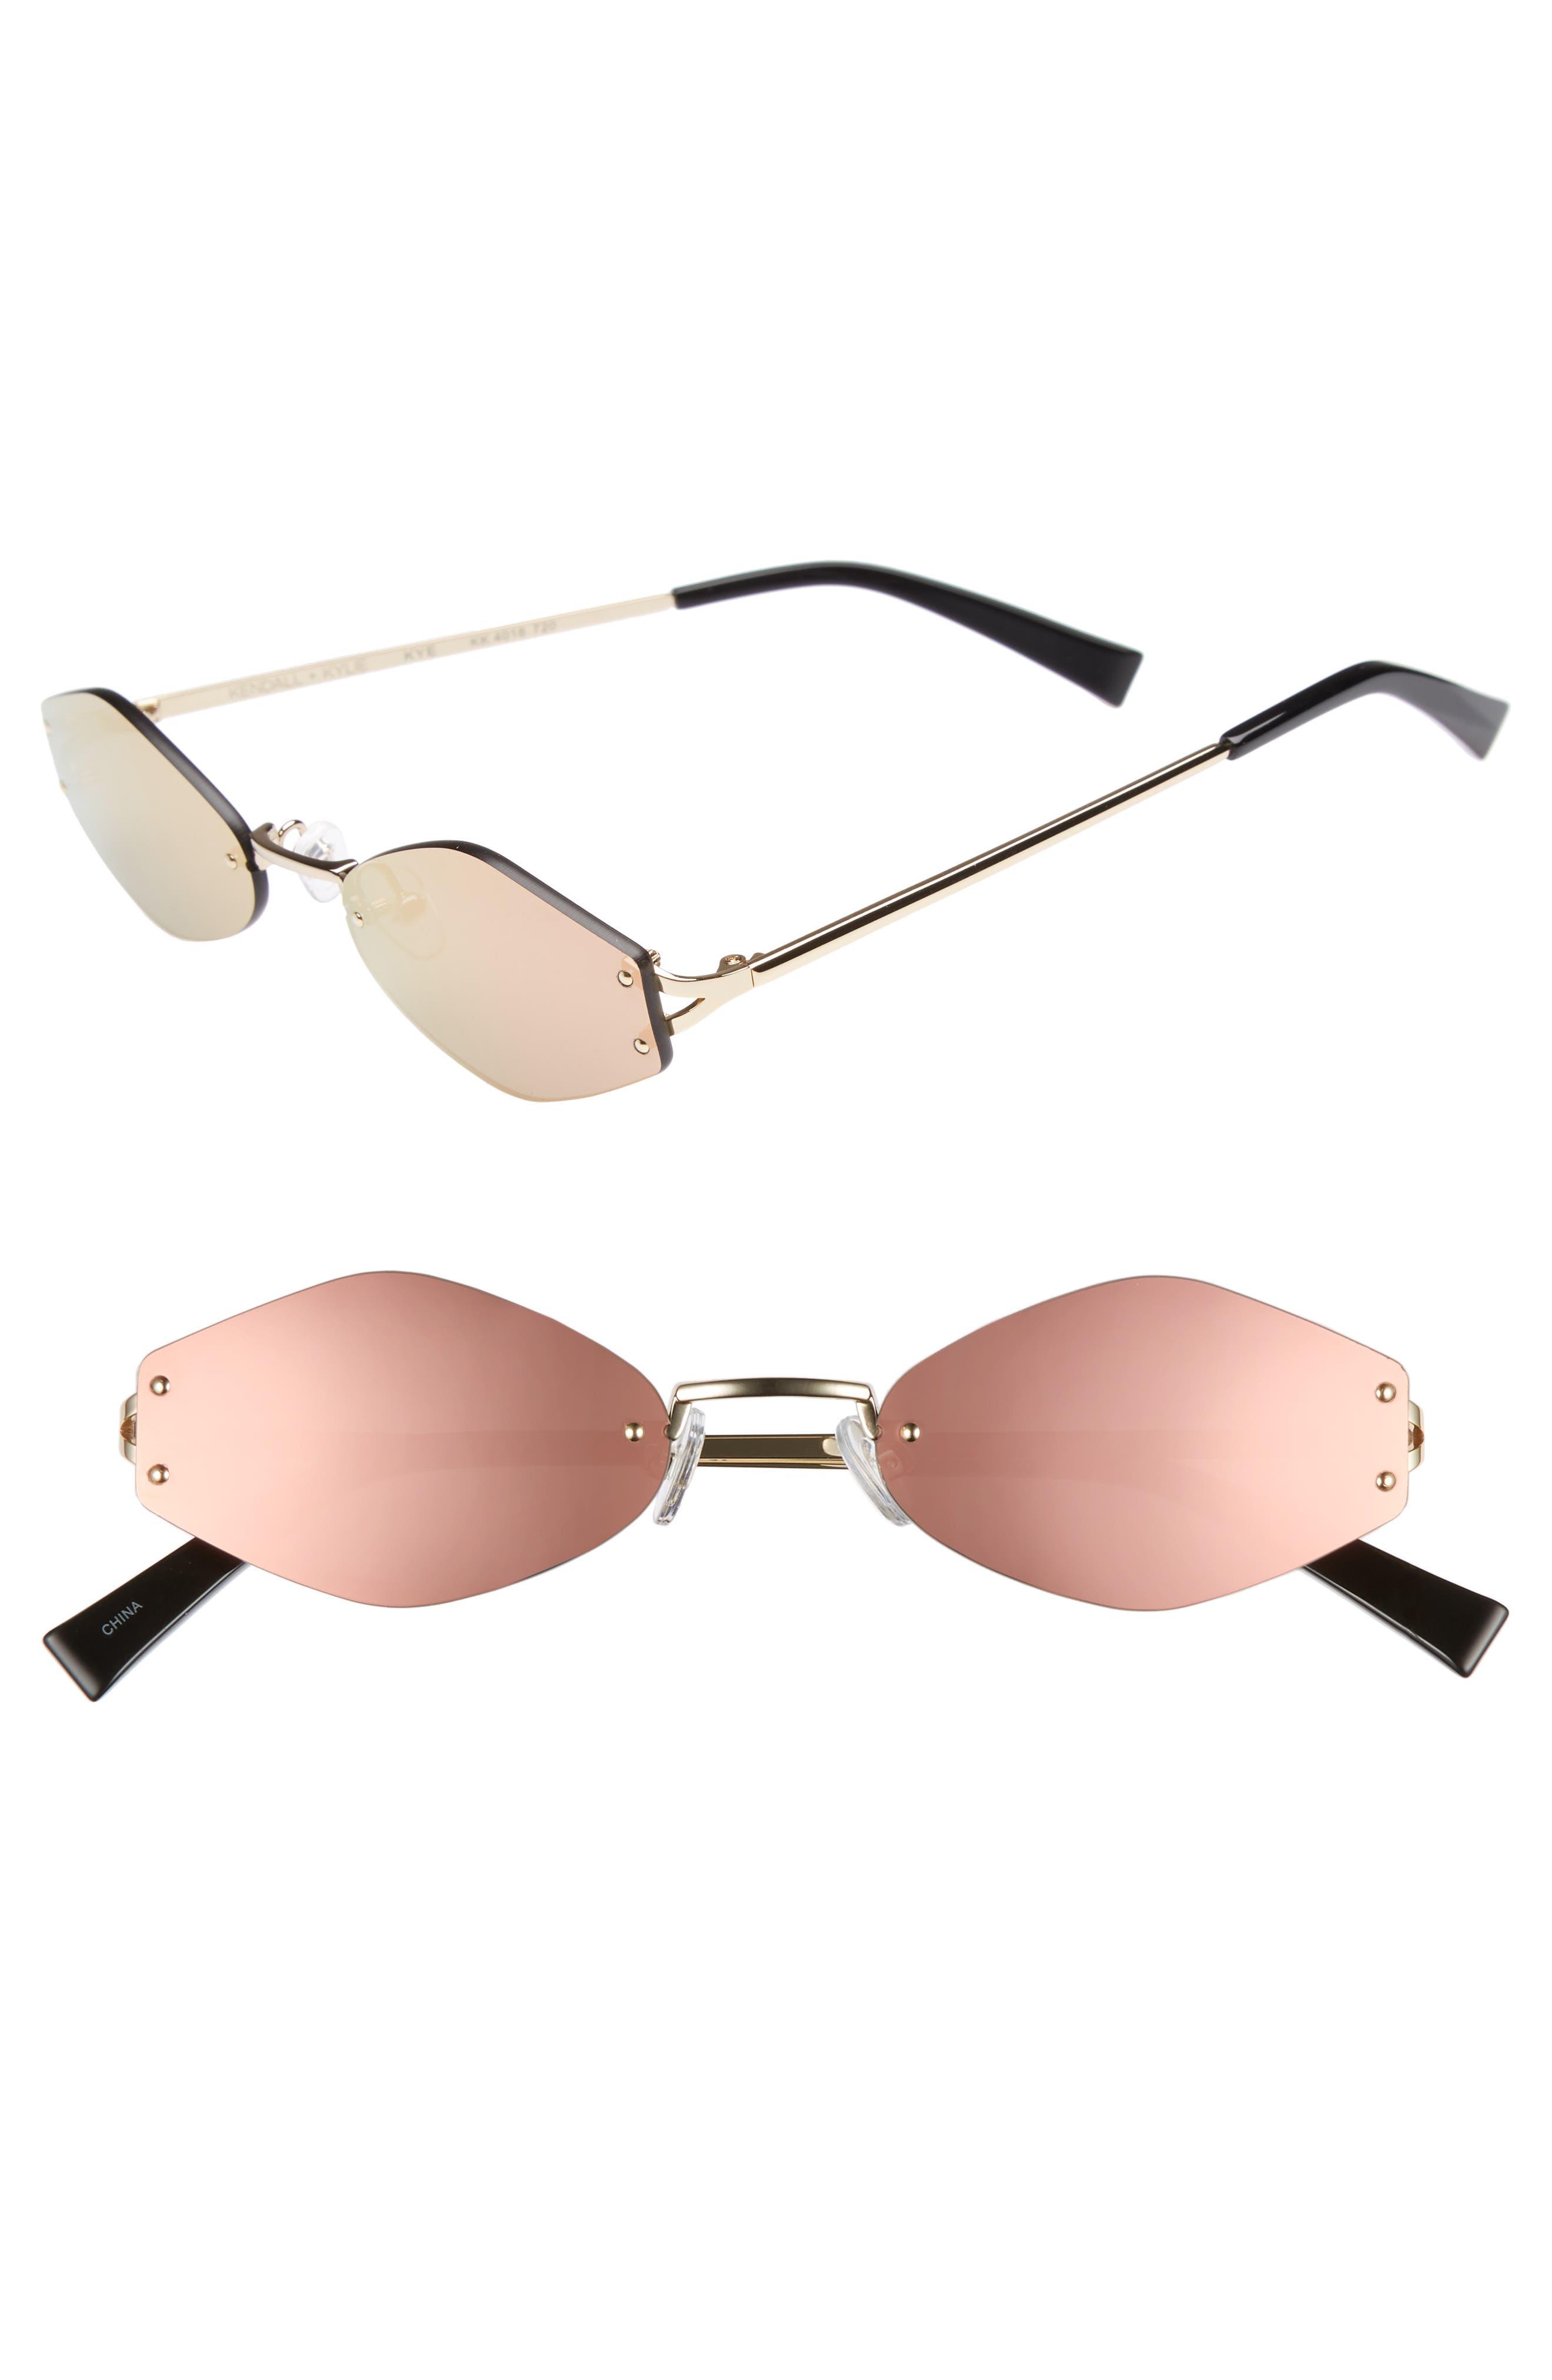 KENDALL + KYLIE 51mm Rimless Geometric Sunglasses